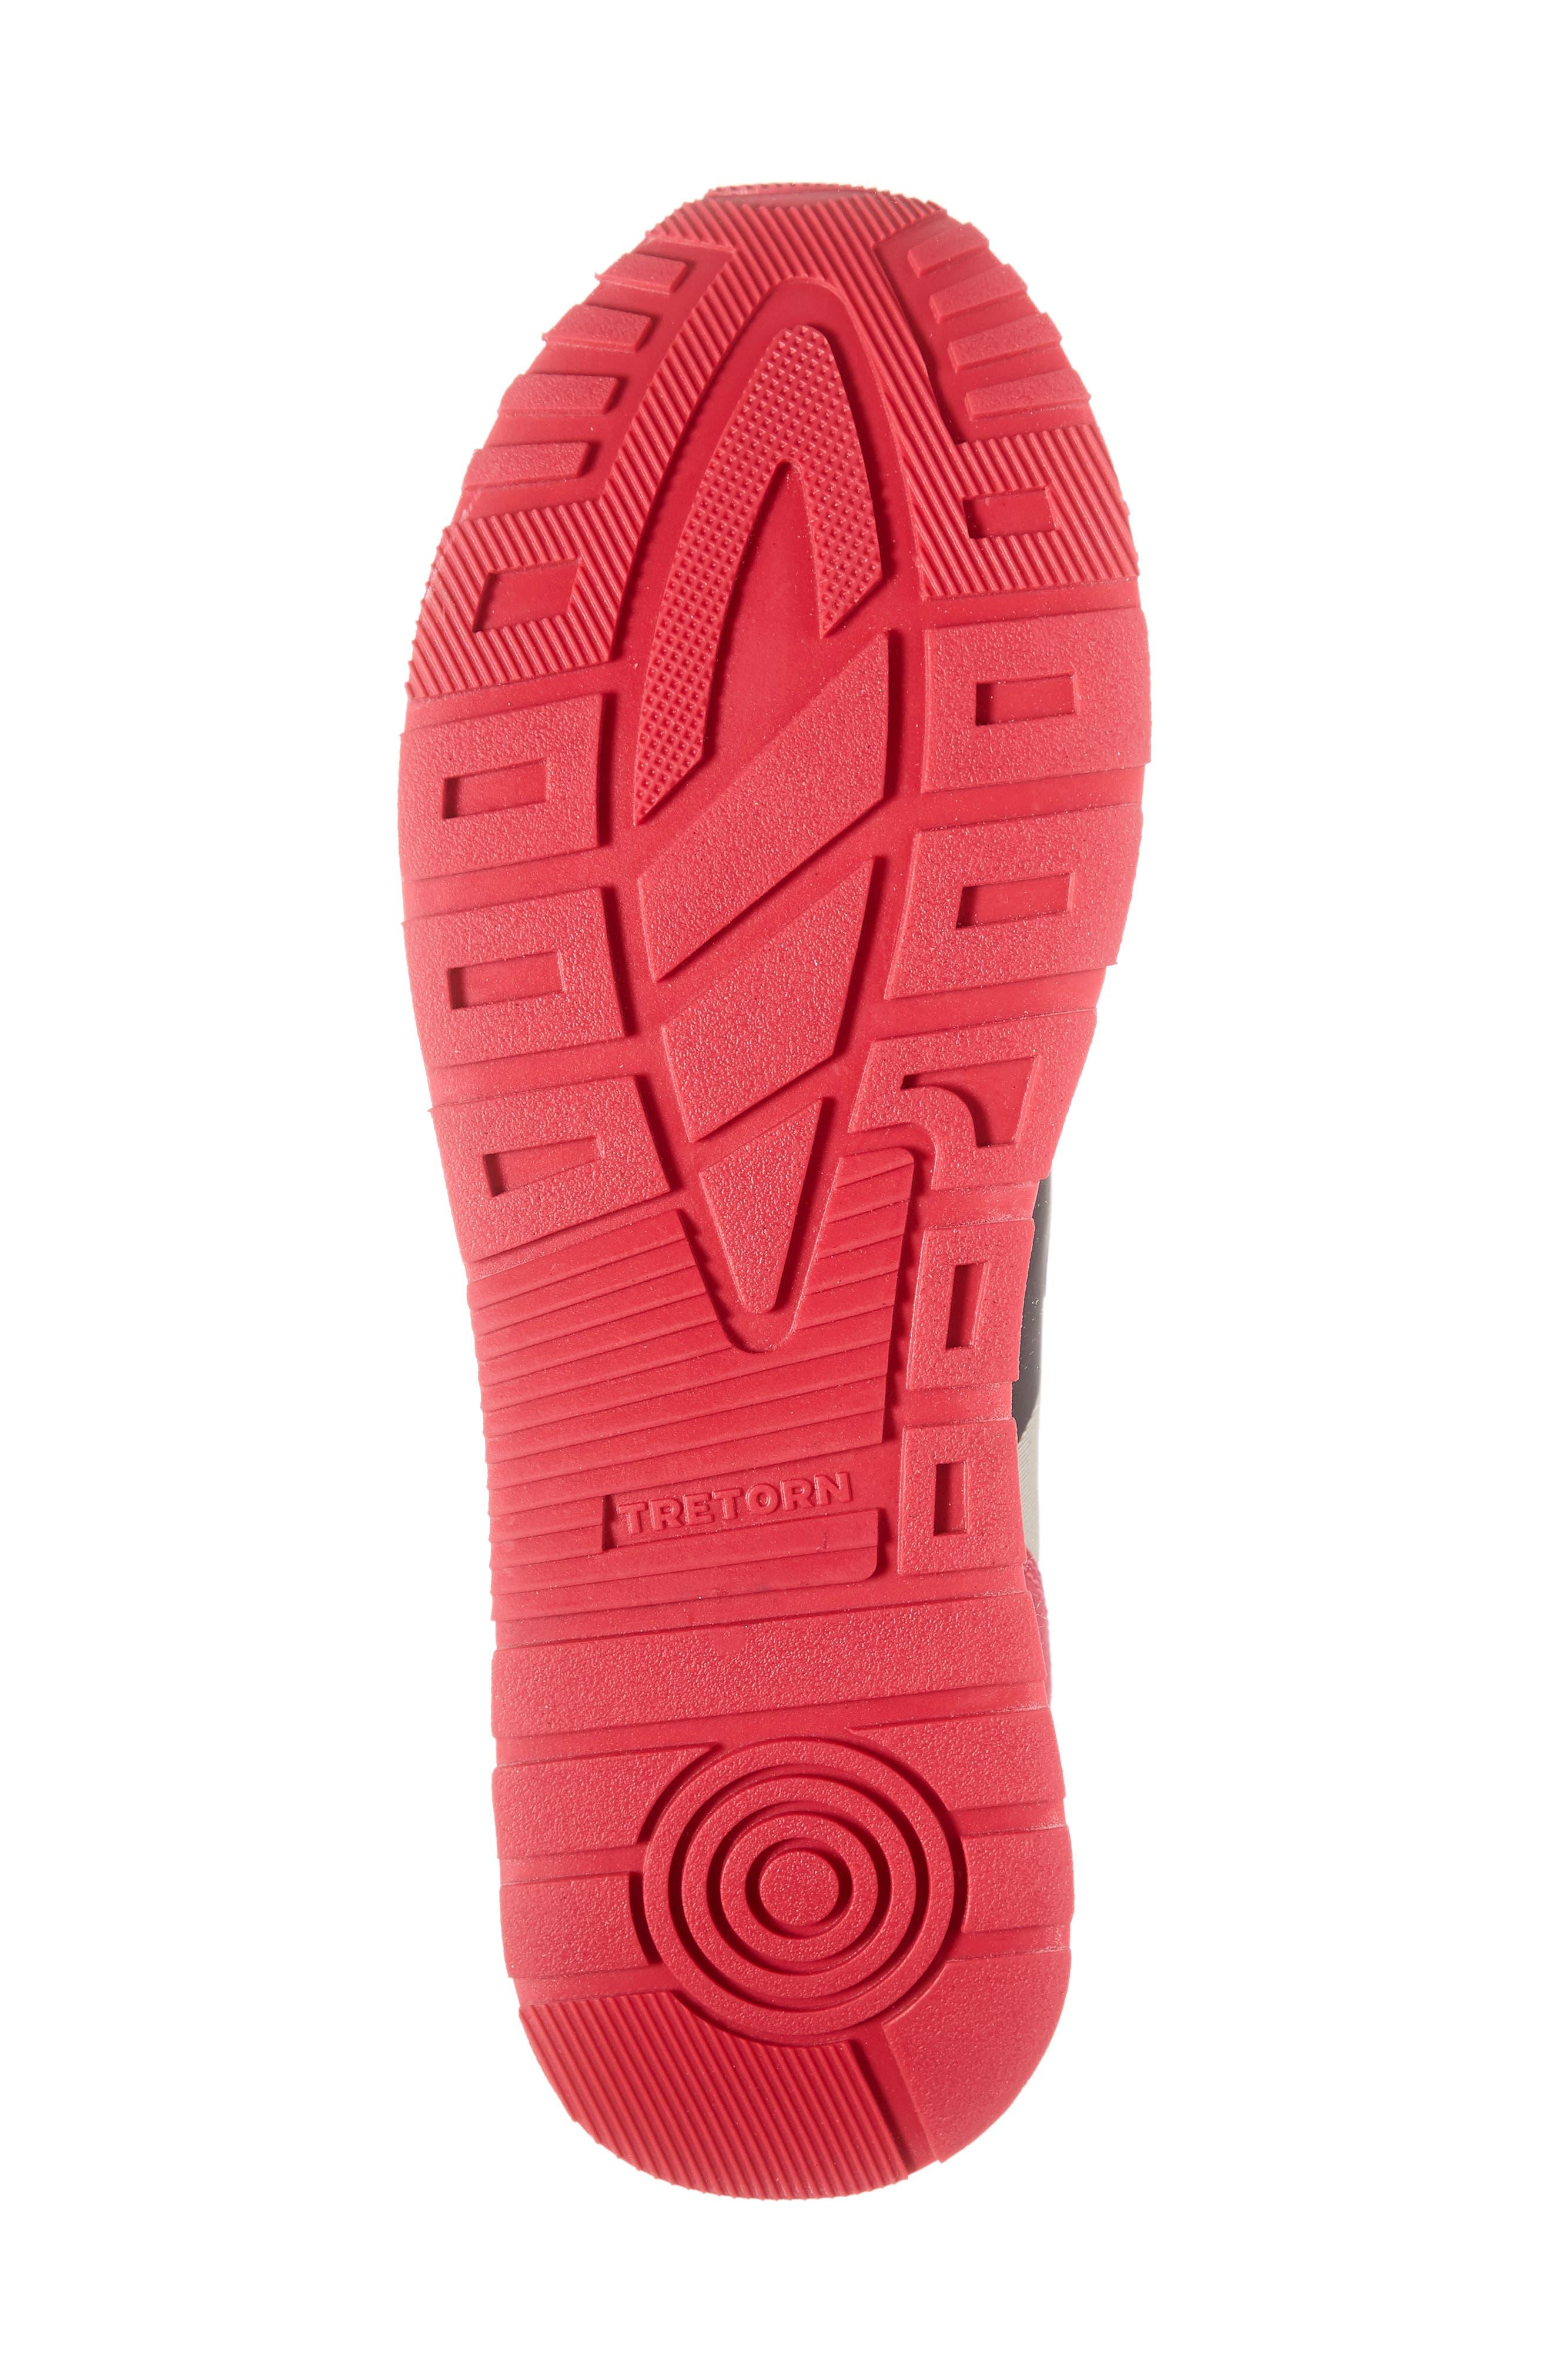 TRETORN,                             Loyola3 Sneaker,                             Alternate thumbnail 6, color,                             GLACIER GREY/ MARSHMALLOW